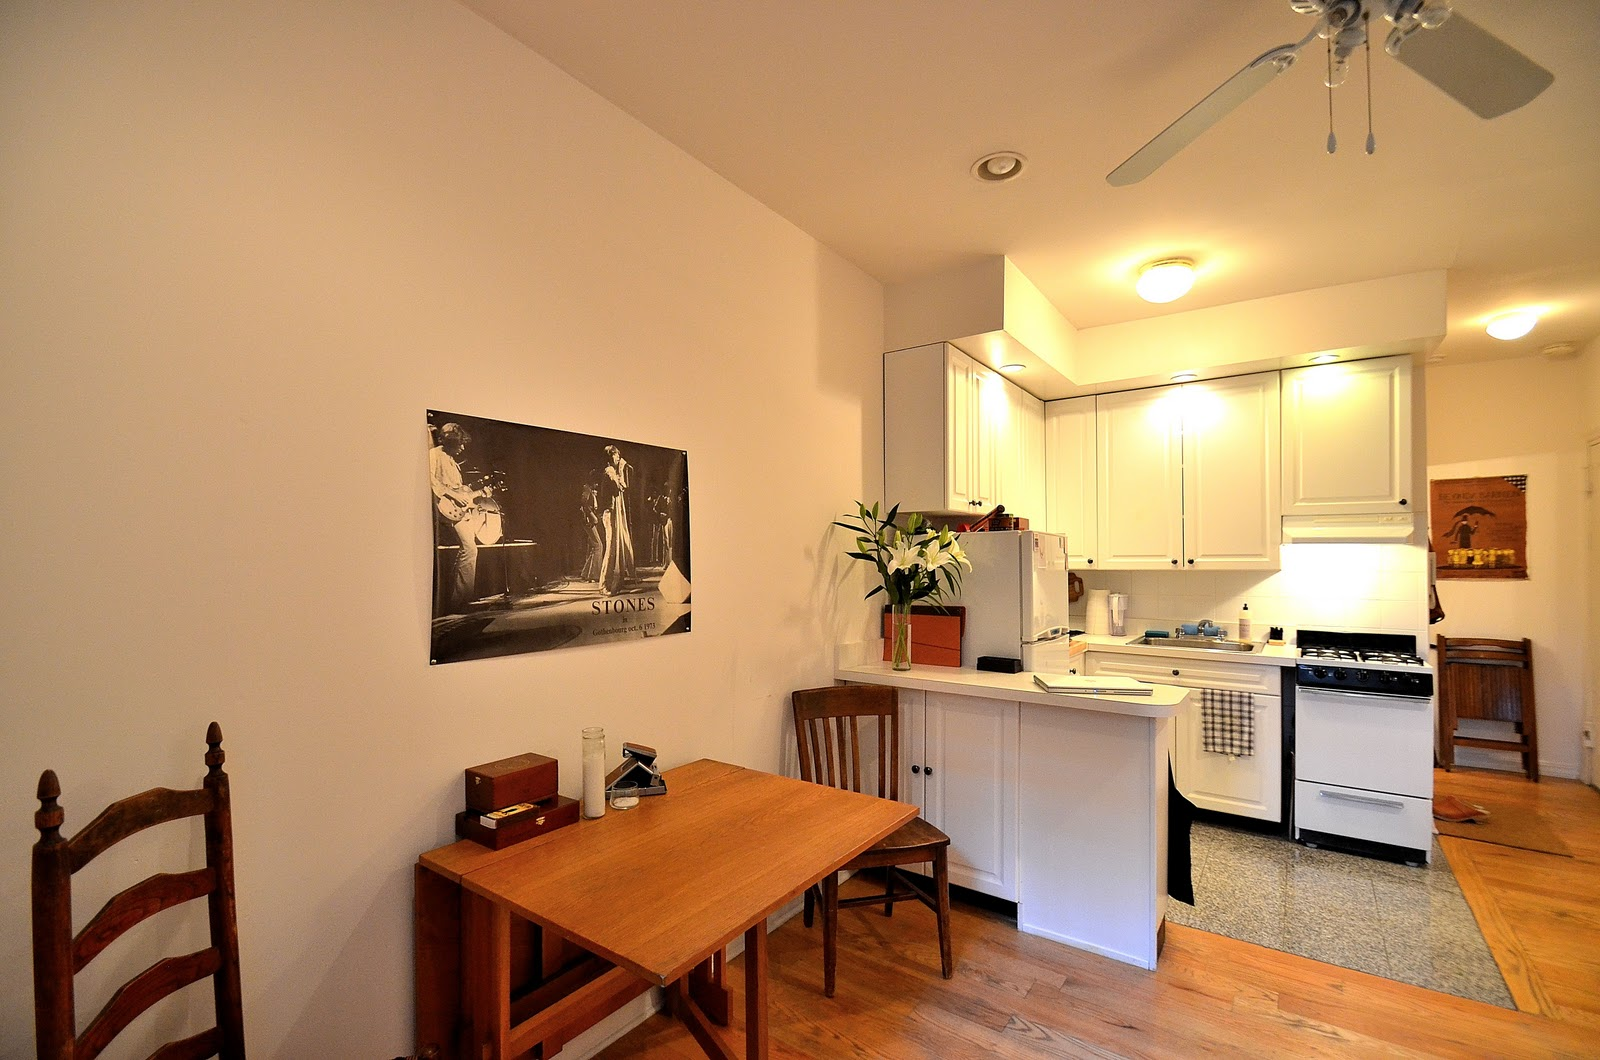 apartments club queens playmania bedroom in for apt studios rent